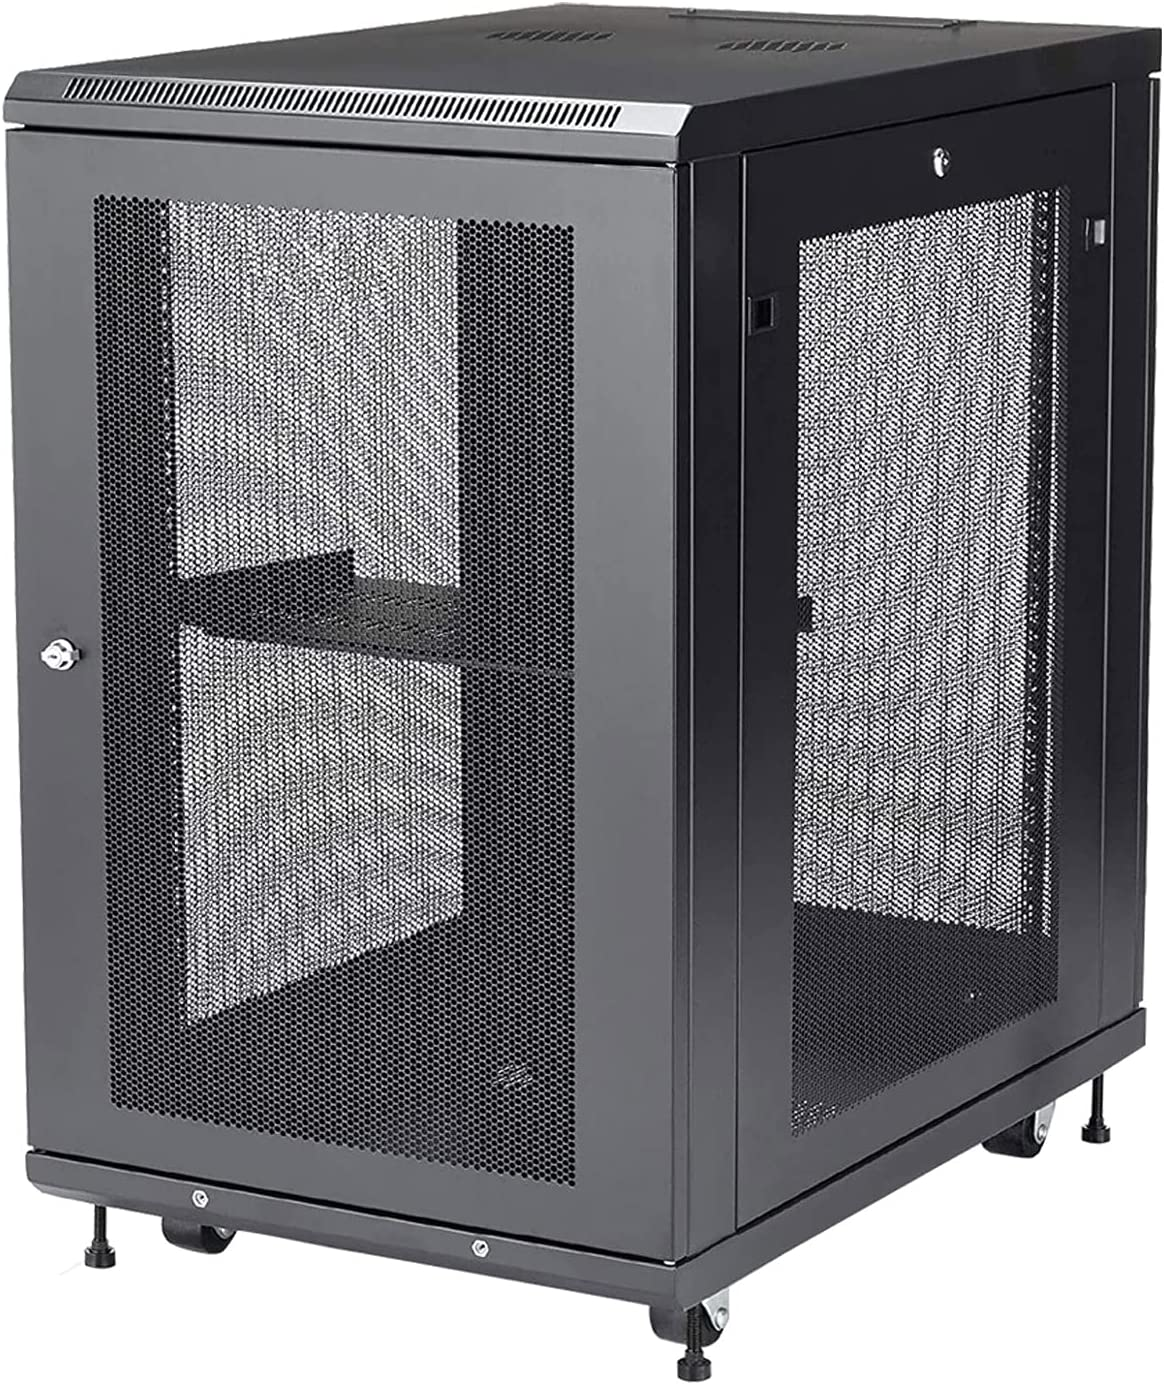 18U Server Rack Cabinet-4-Post Adjustable Depth,ApplytoNetworkWiringRoom,ComputerRoom,DataRoom,ControlCenter,Home,Office,etc.SoldbyFerruNet